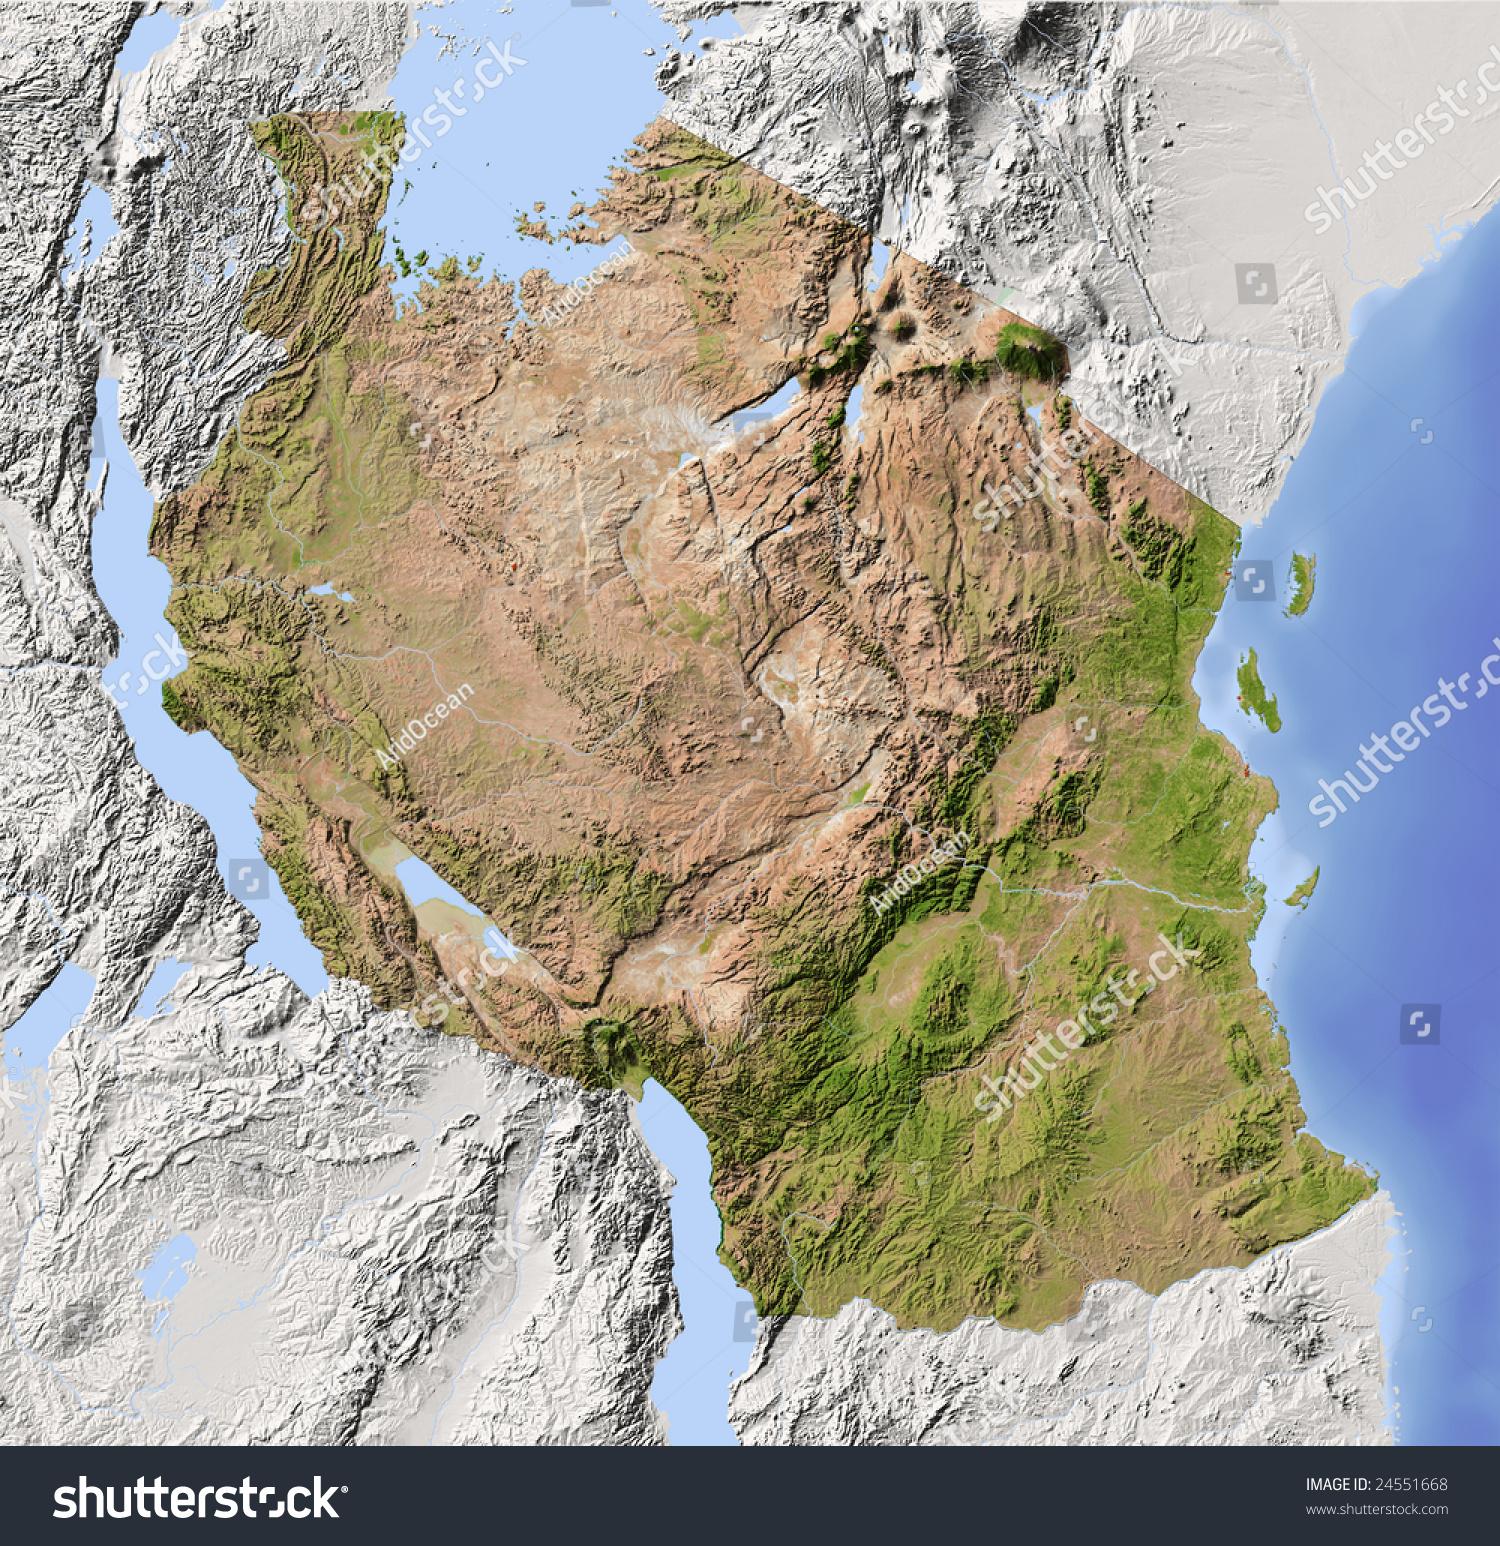 Tanzania Shaded Relief Map Surrounding Territory Stock